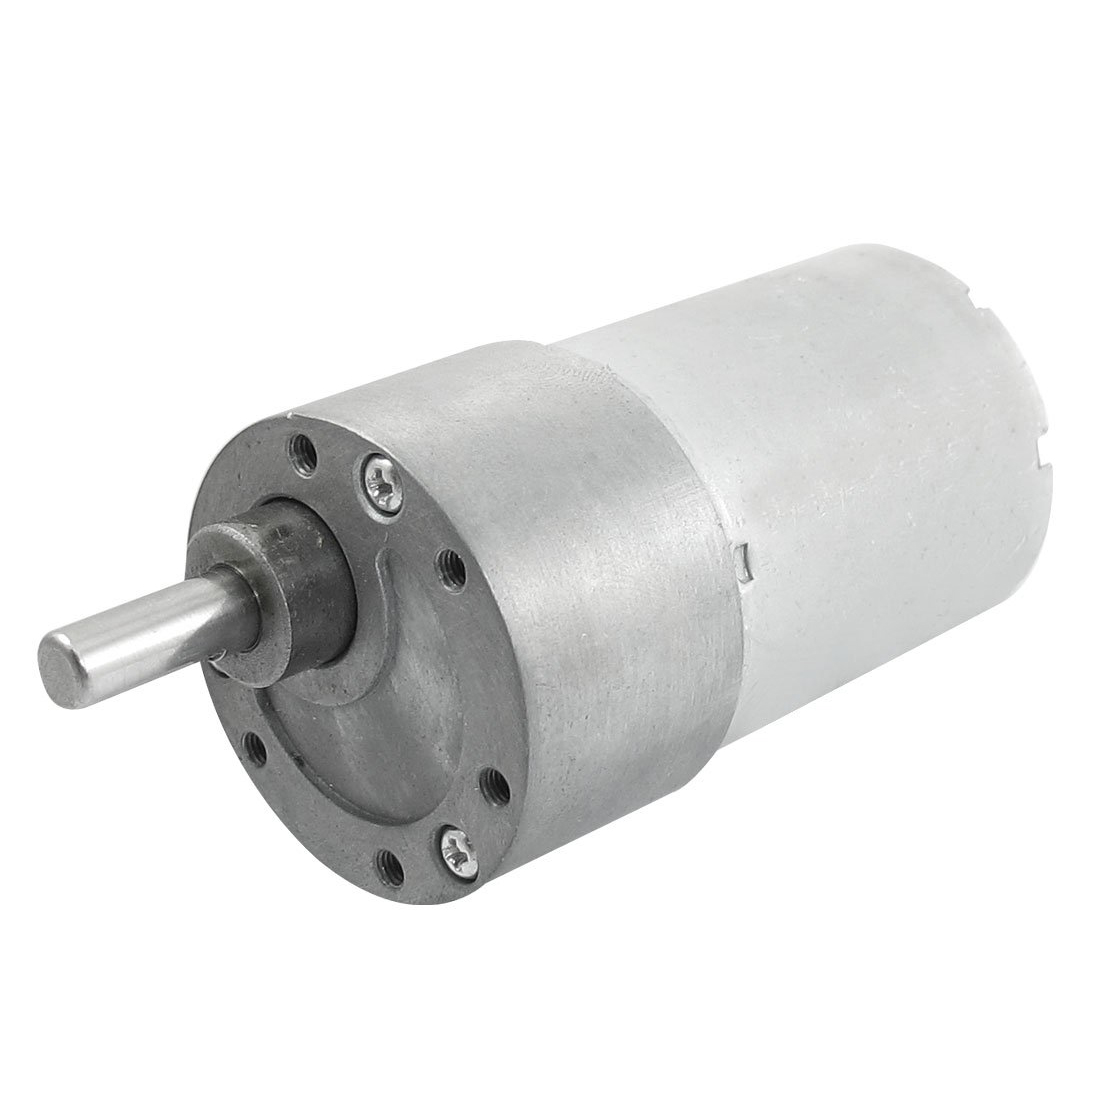 Z2g3 10x 300 rpm dc 12v 2 4w torque gear box electric for 300 rpm high torque dc motor